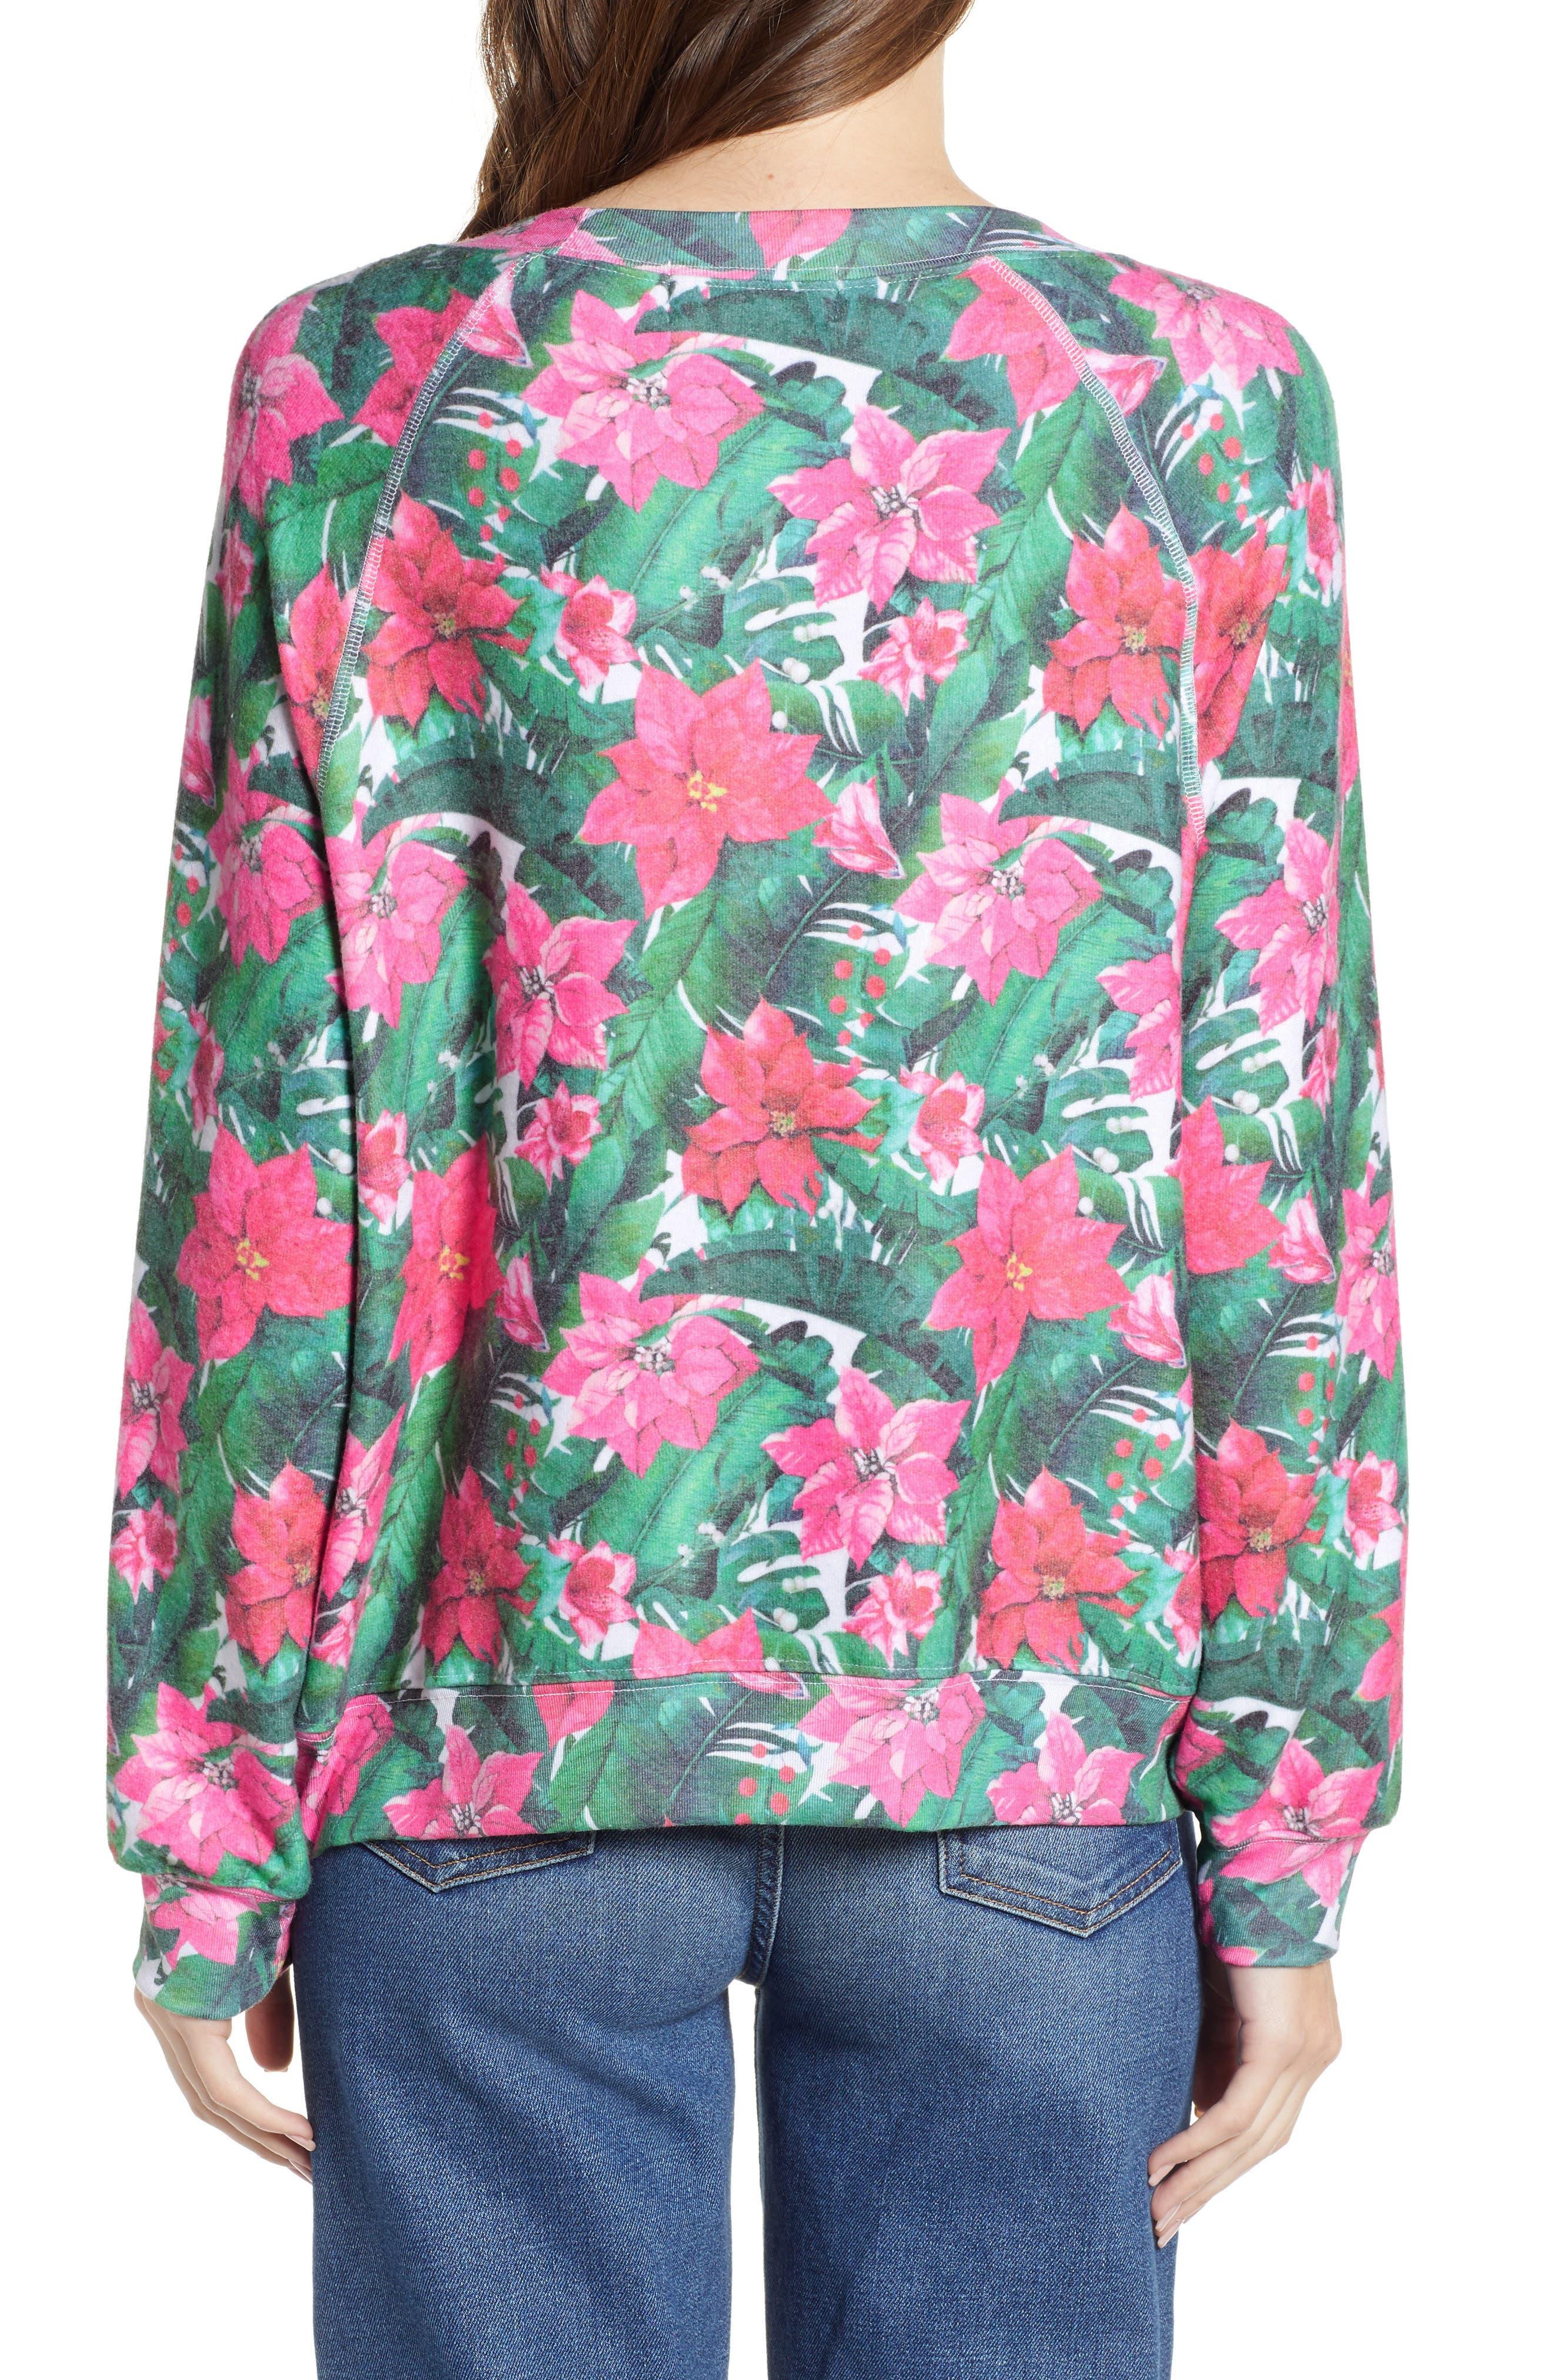 Island Holiday Sommers Sweatshirt,                             Alternate thumbnail 2, color,                             MULTI